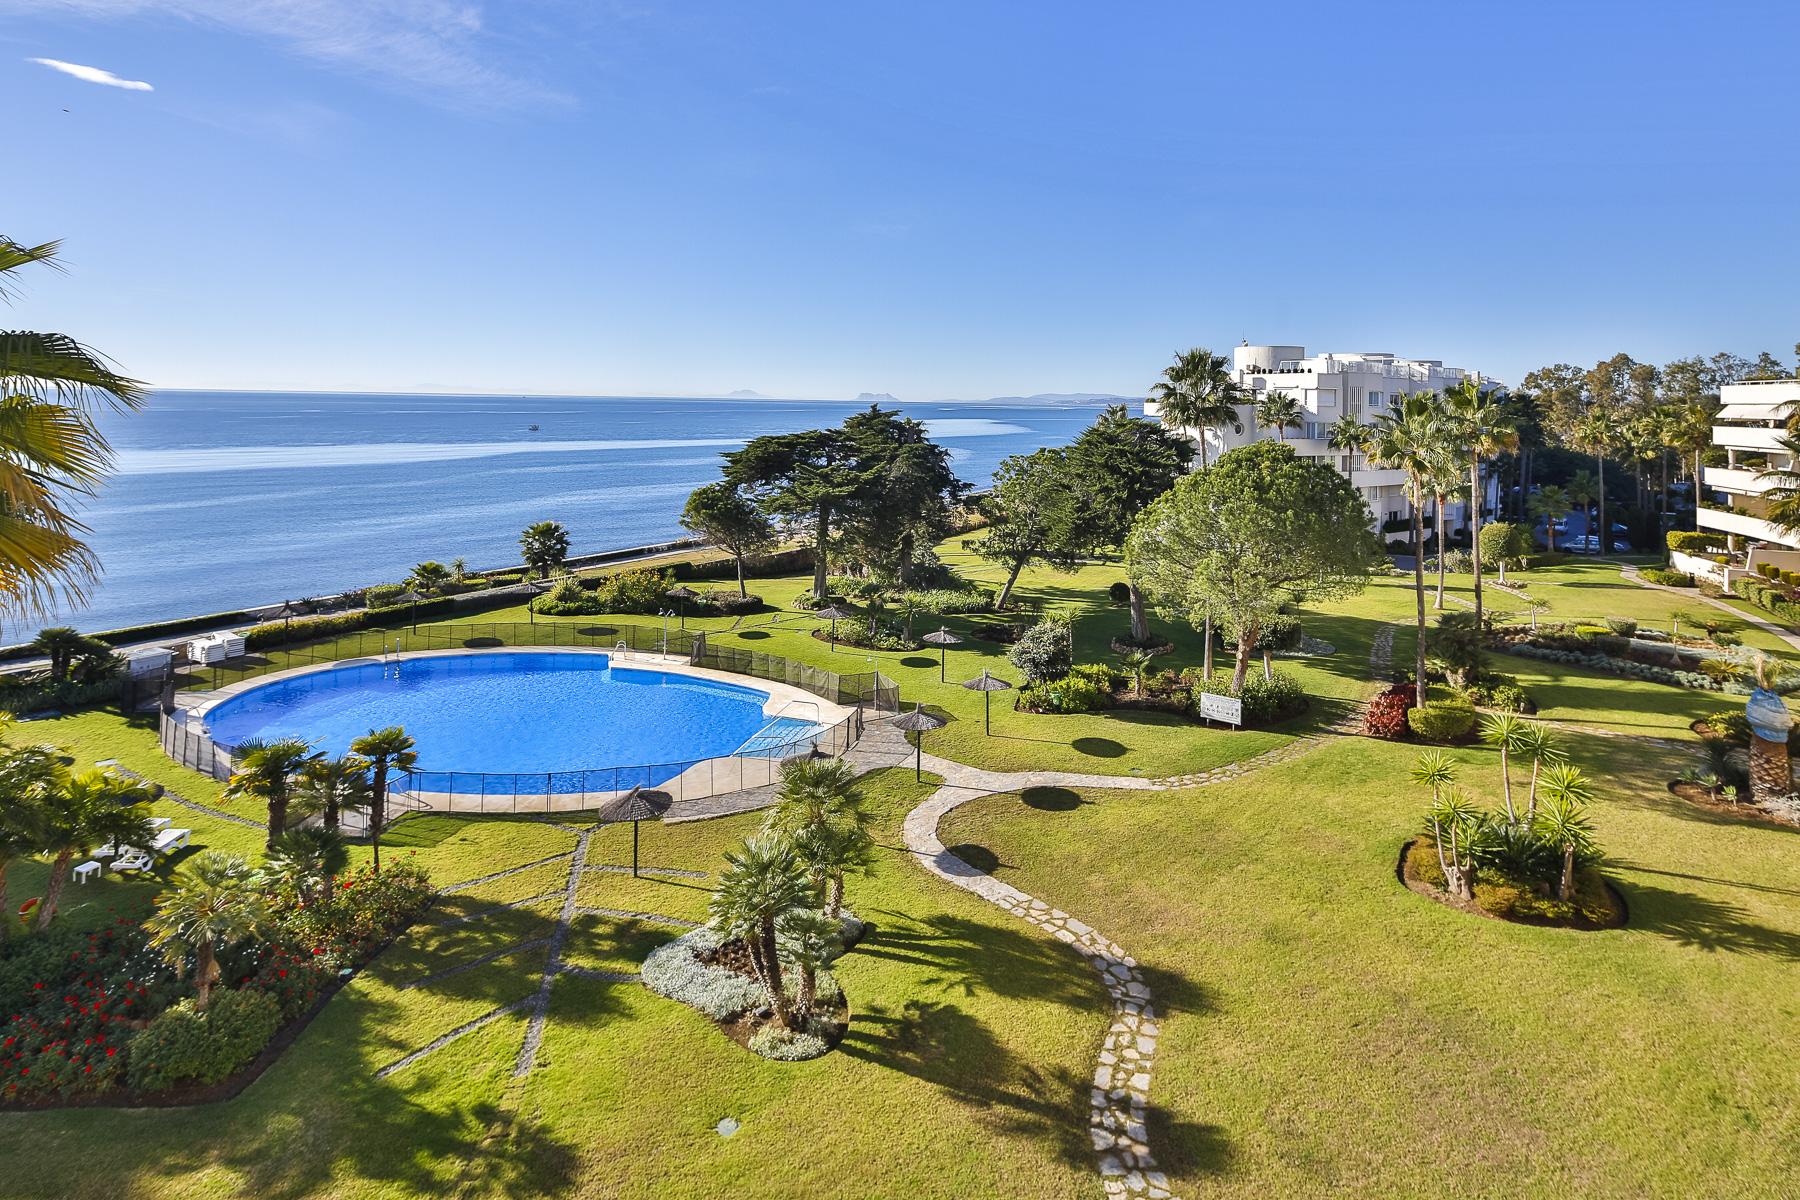 شقة للـ Sale في Large and bright four bedroom apartment enjoying amazing sea views Estepona, Andalucia, Spain